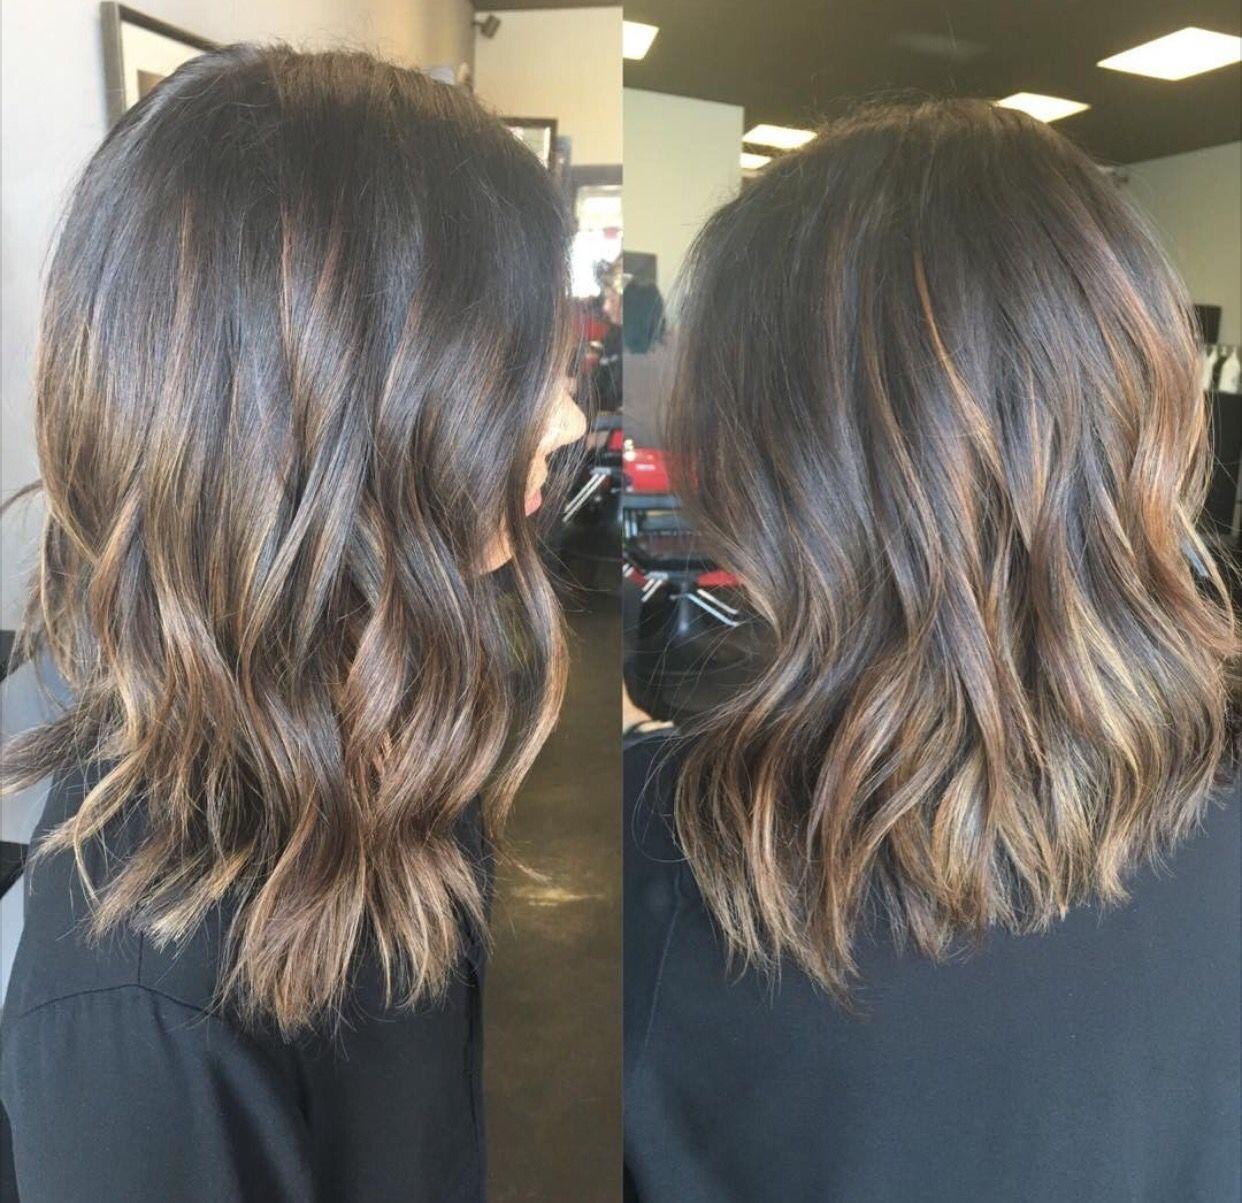 Subtle brunette balayage lob | Vanity | Pinterest ...